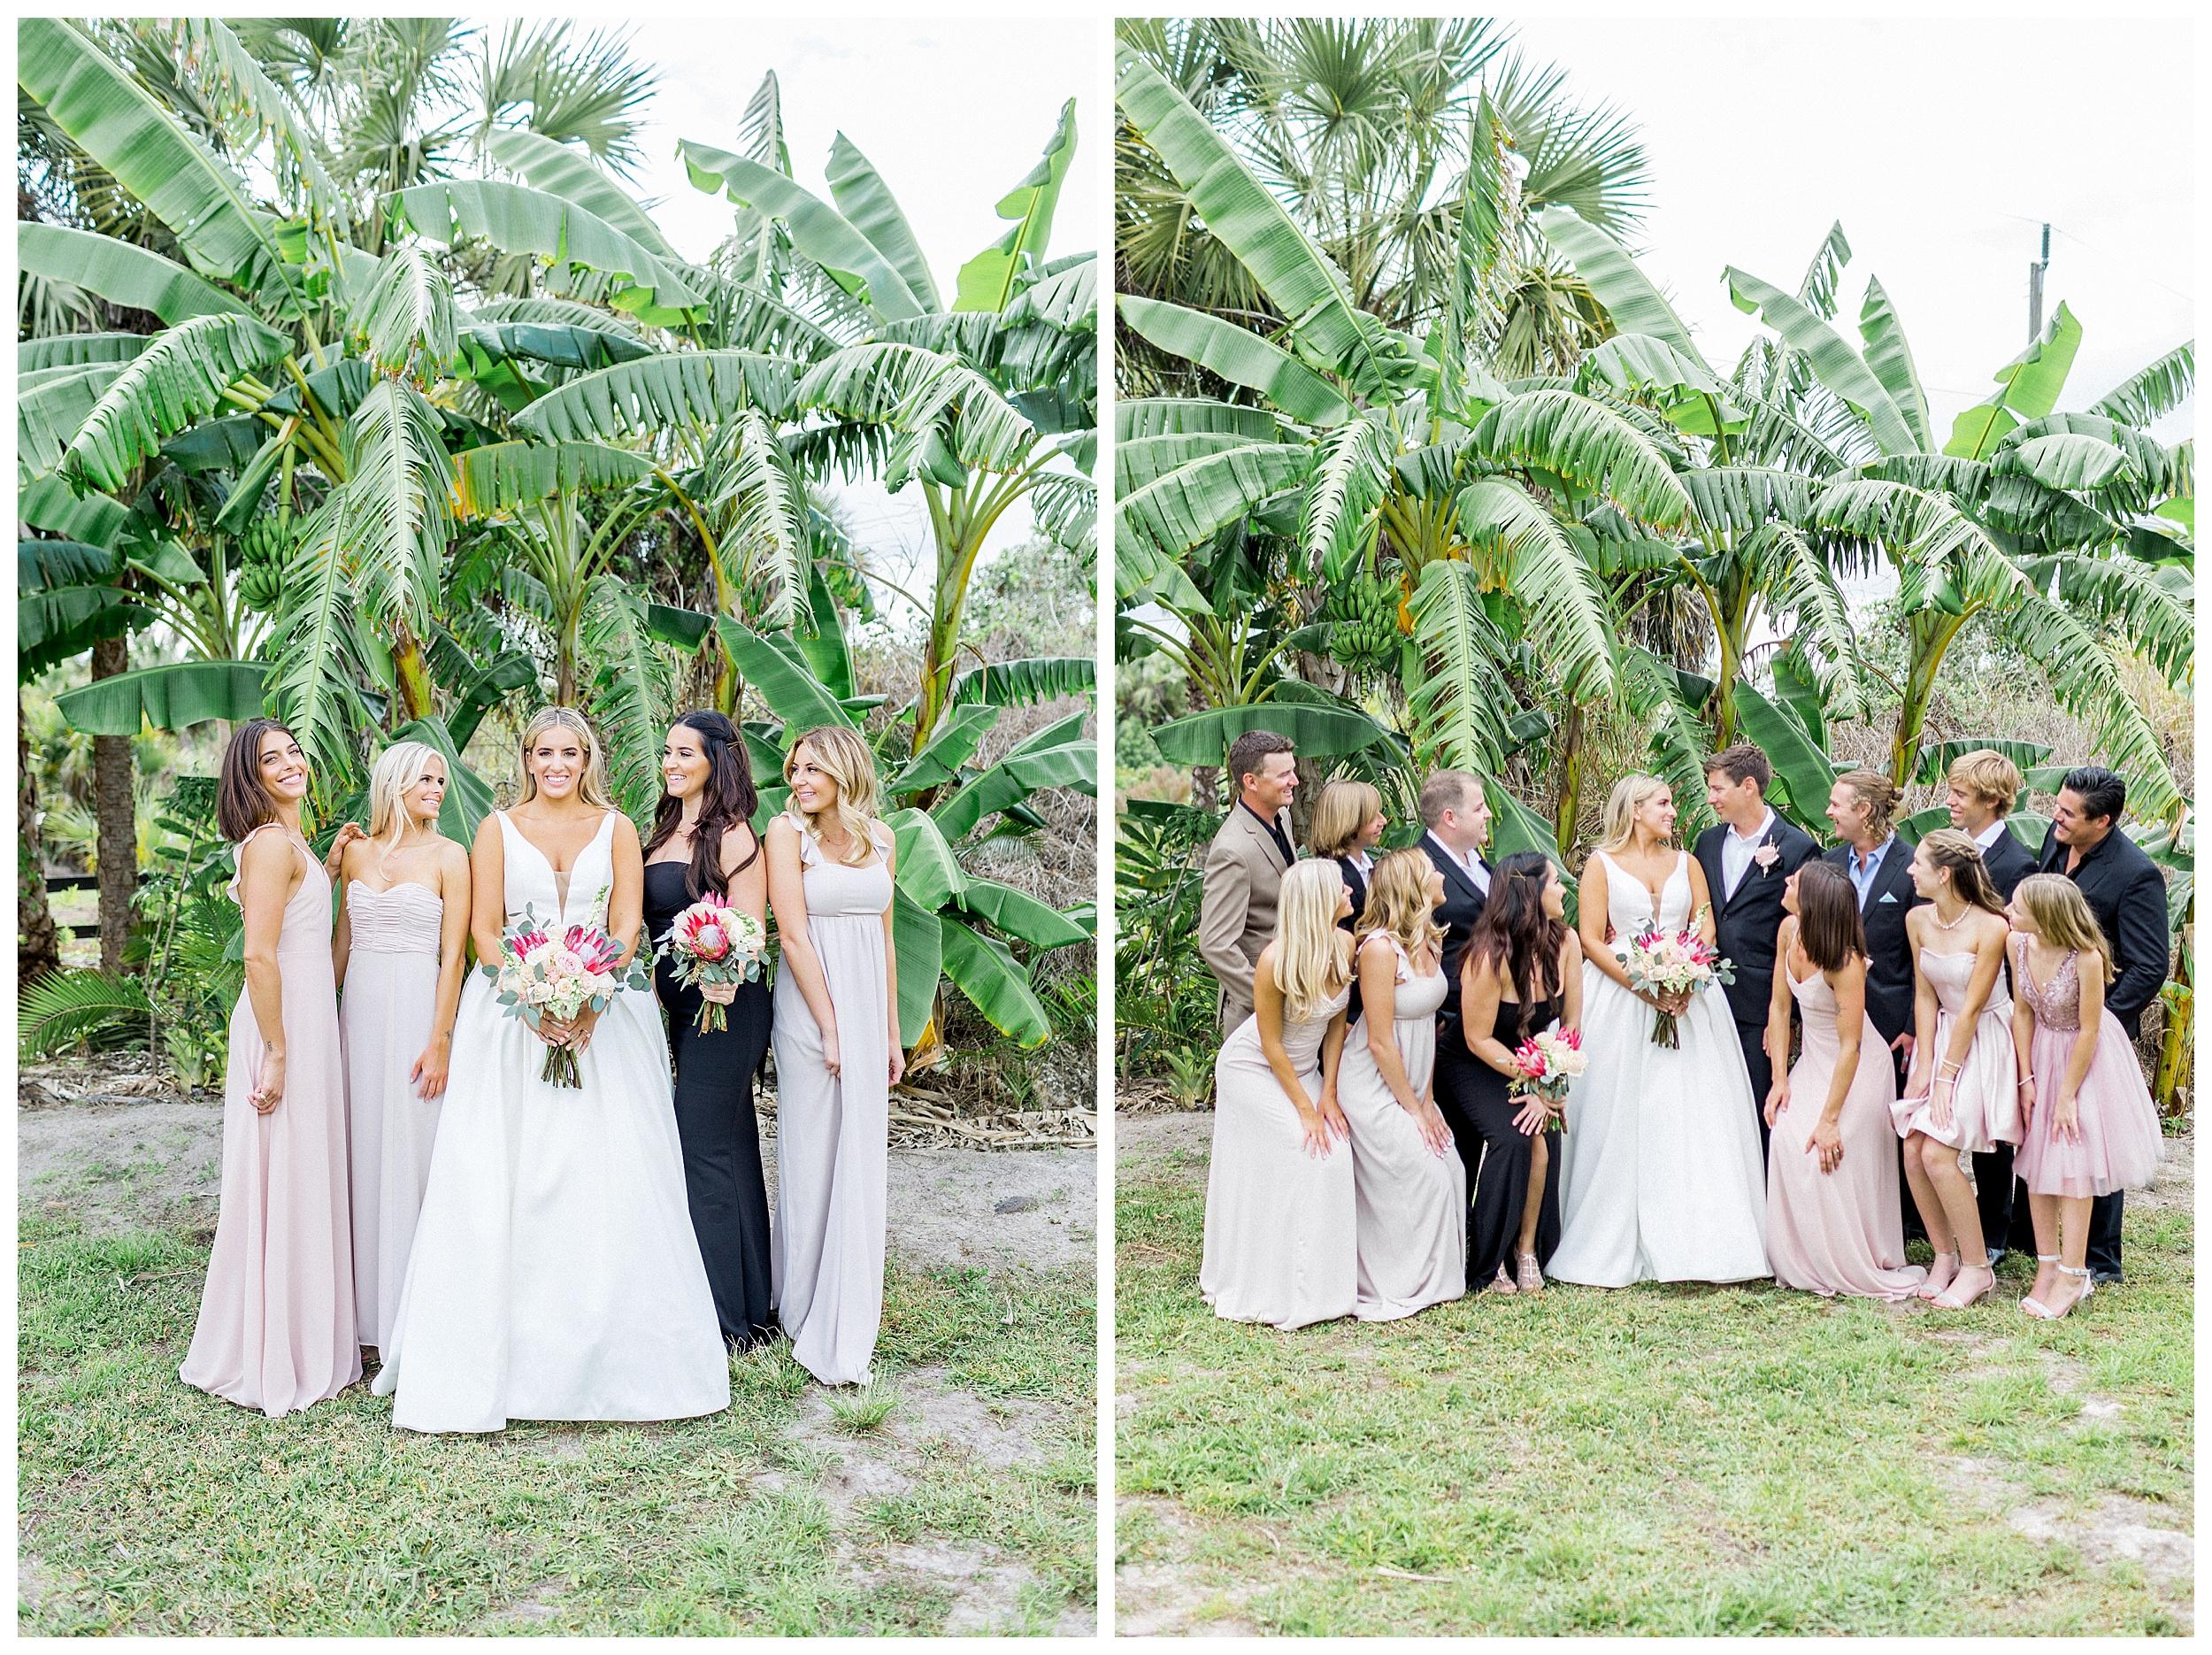 South Florida Wedding Photographer Kir Tuben_0067.jpg